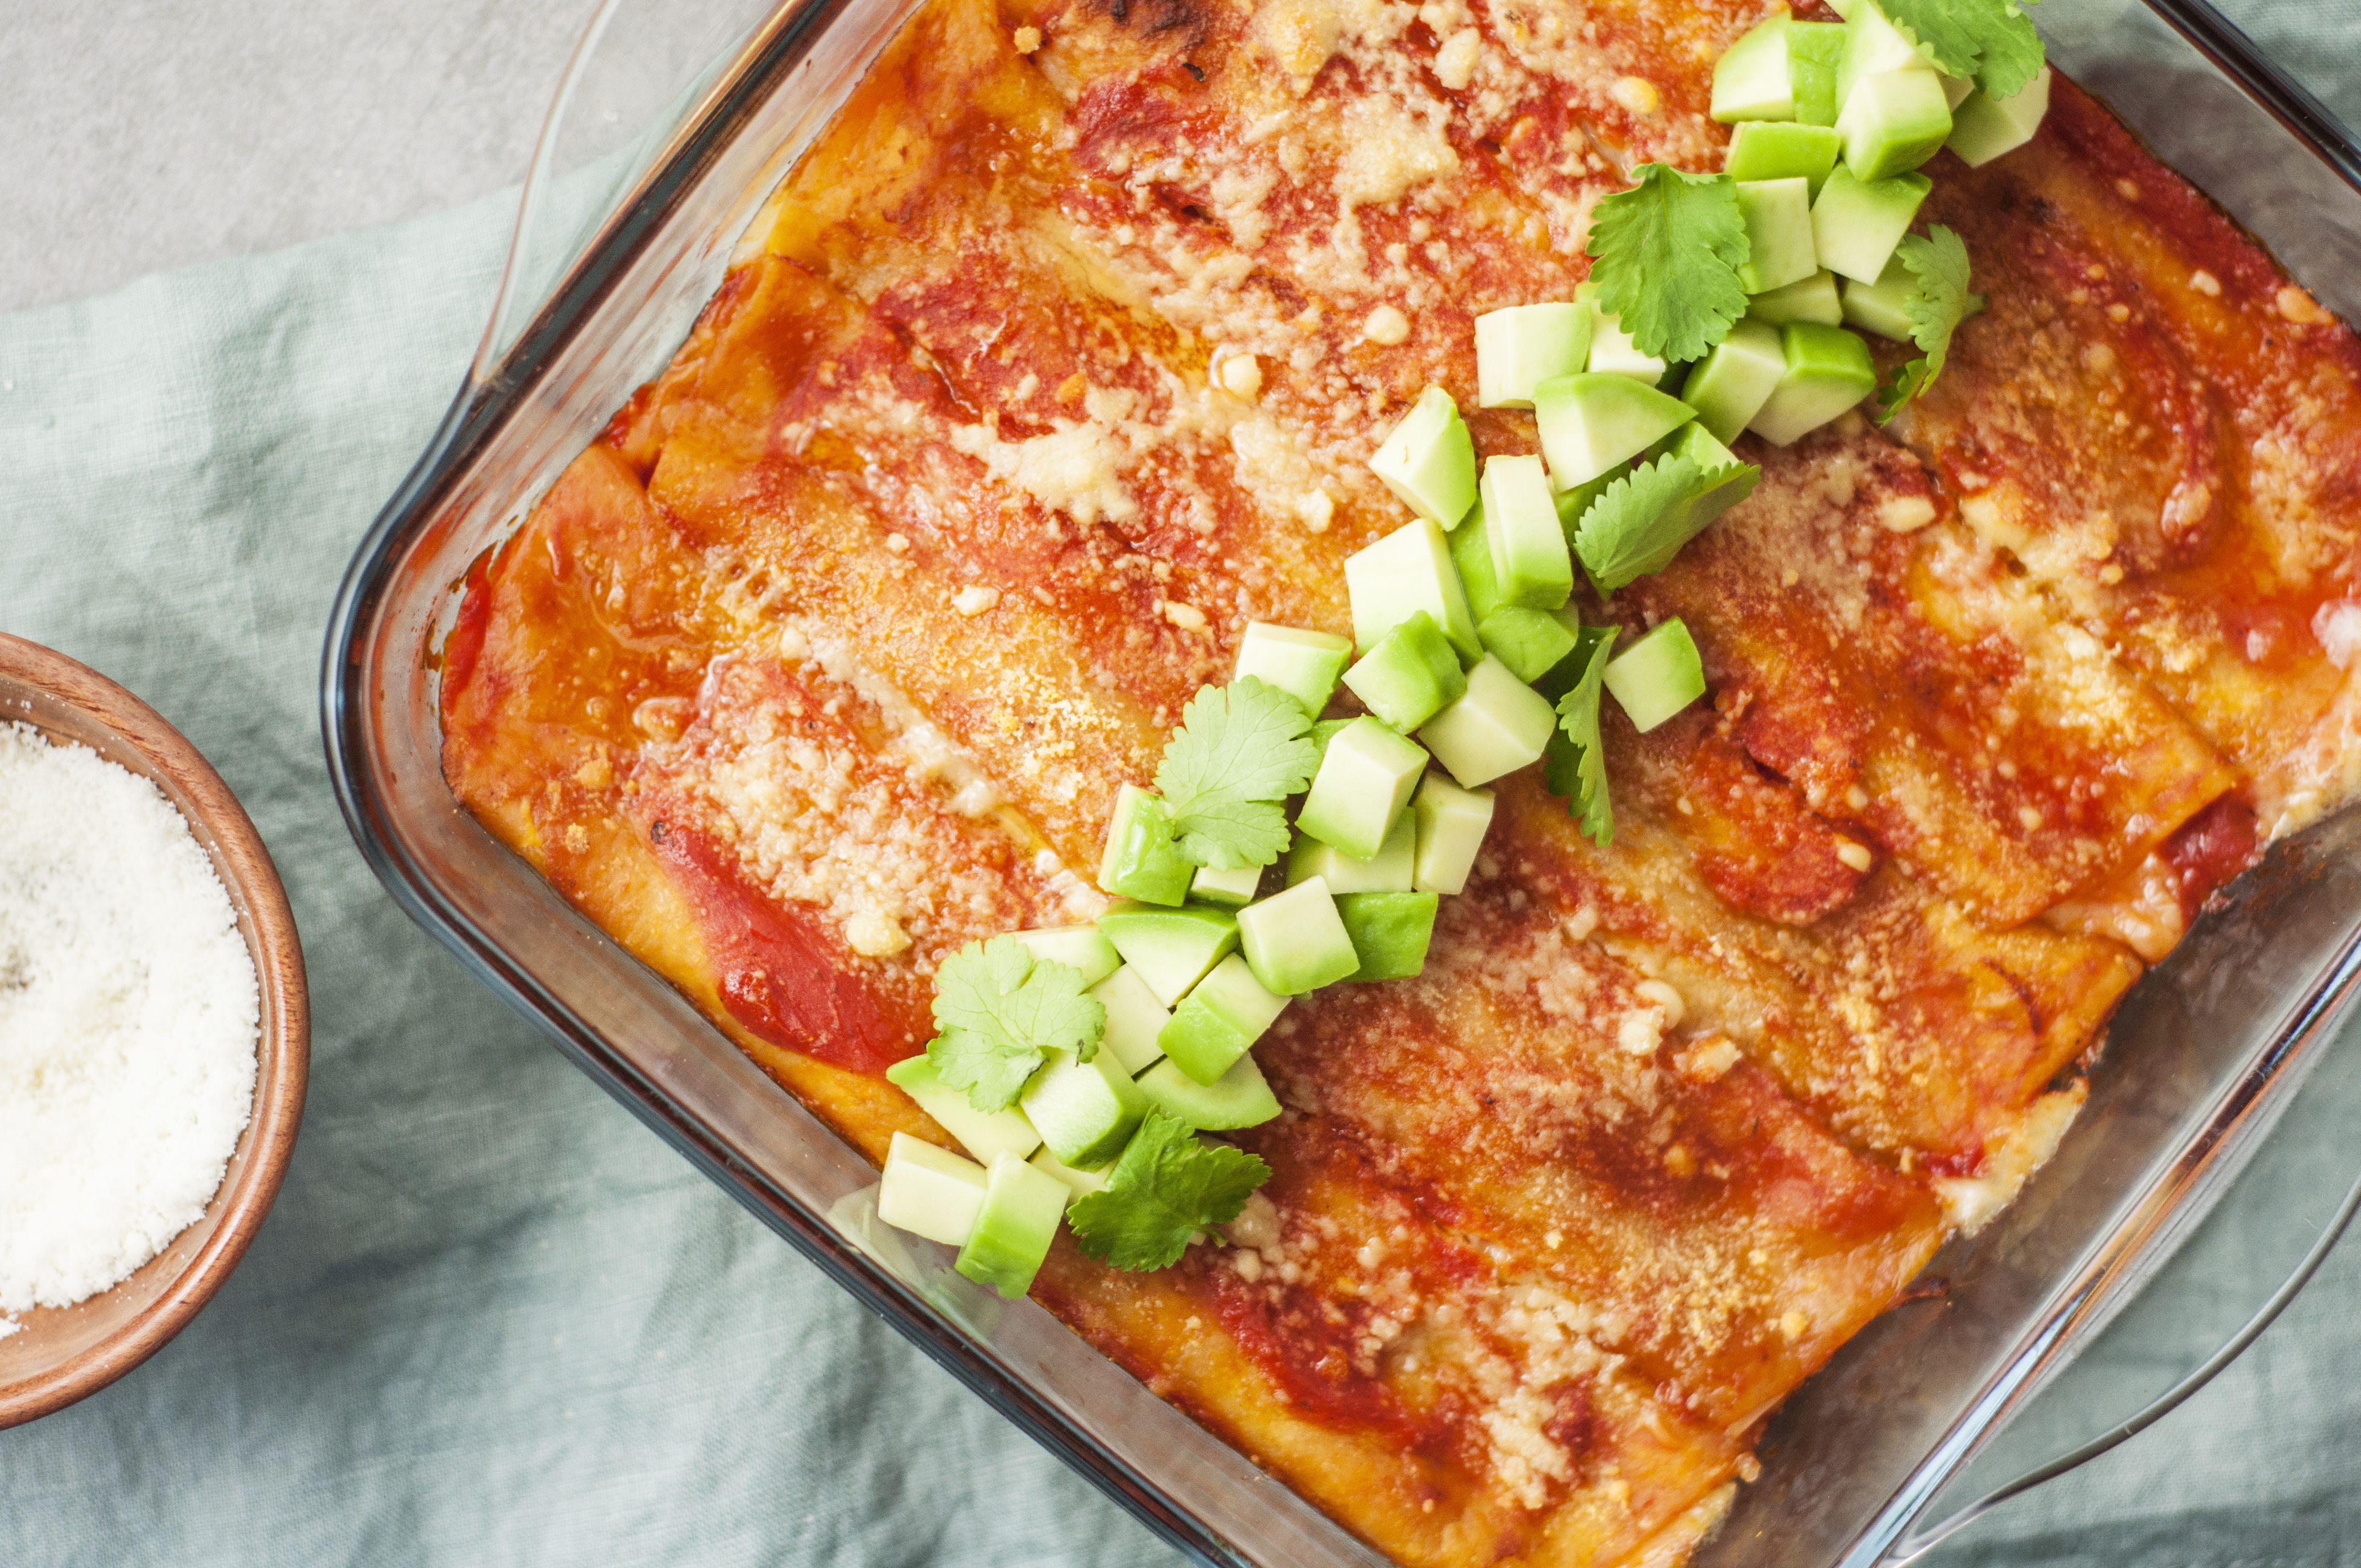 30 Minute Mexican Enchiladas Recipe